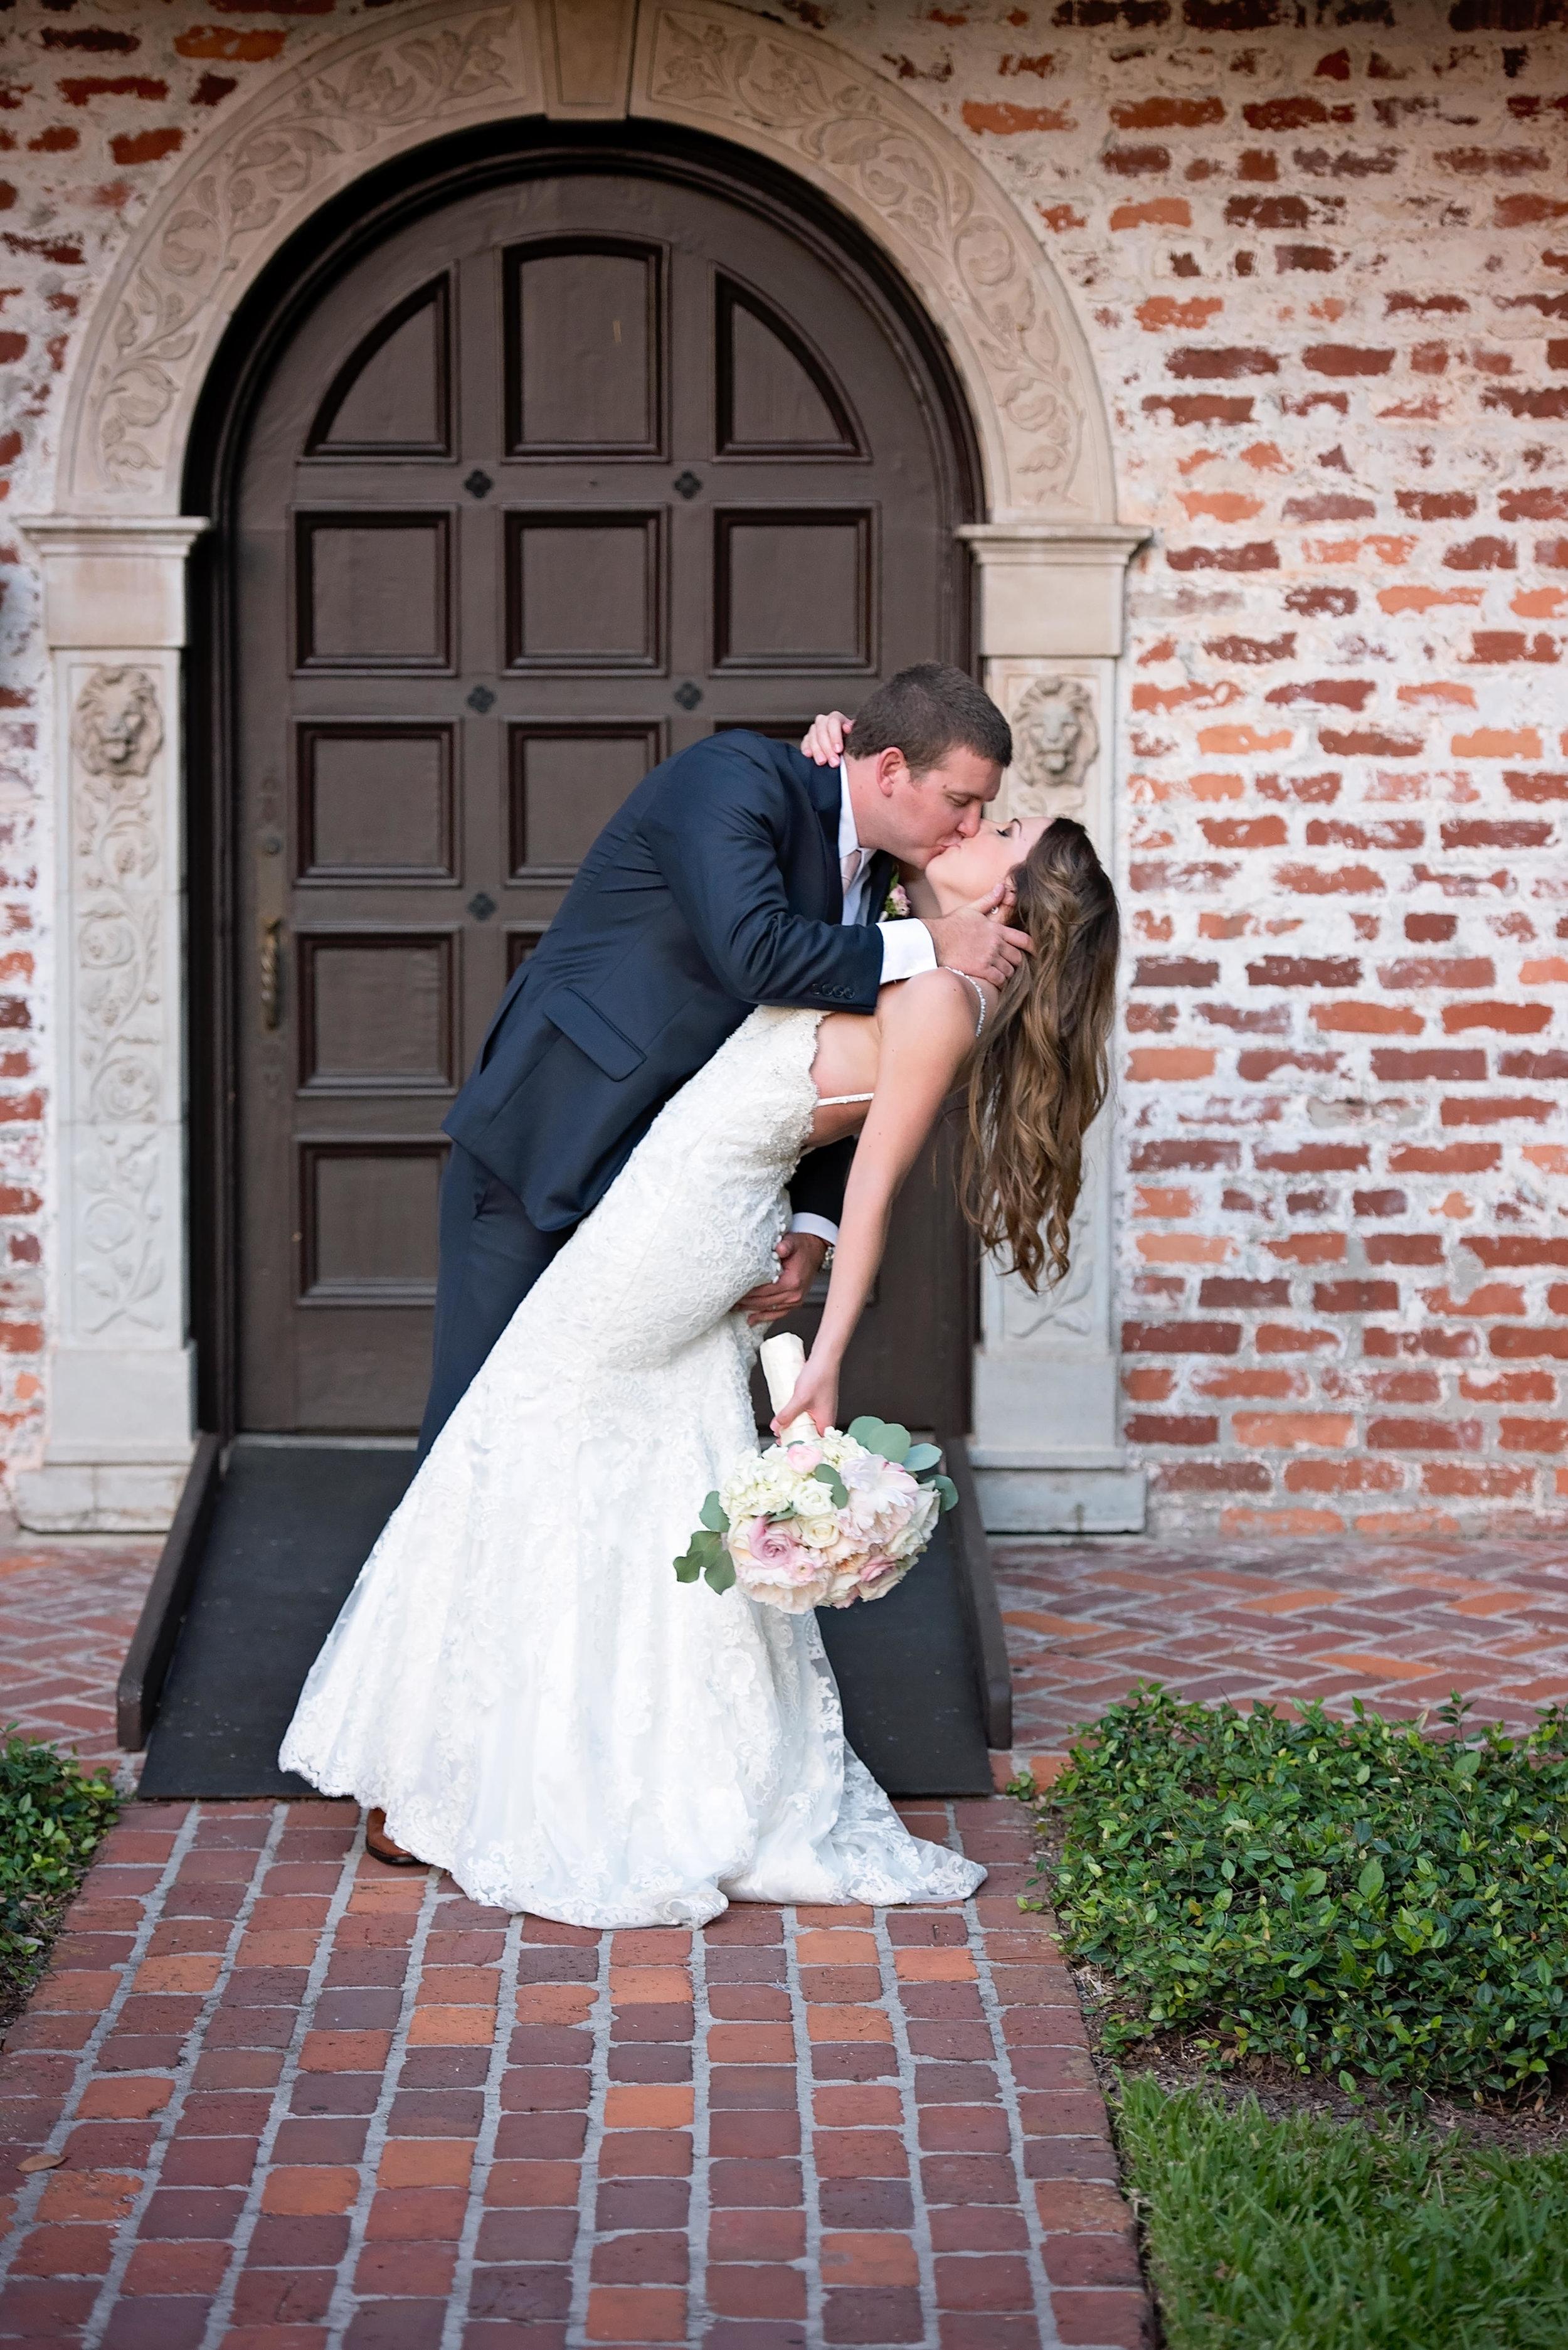 Gorgeous Wedding Photos - Blush and White Wedding - Los Feliz Wedding